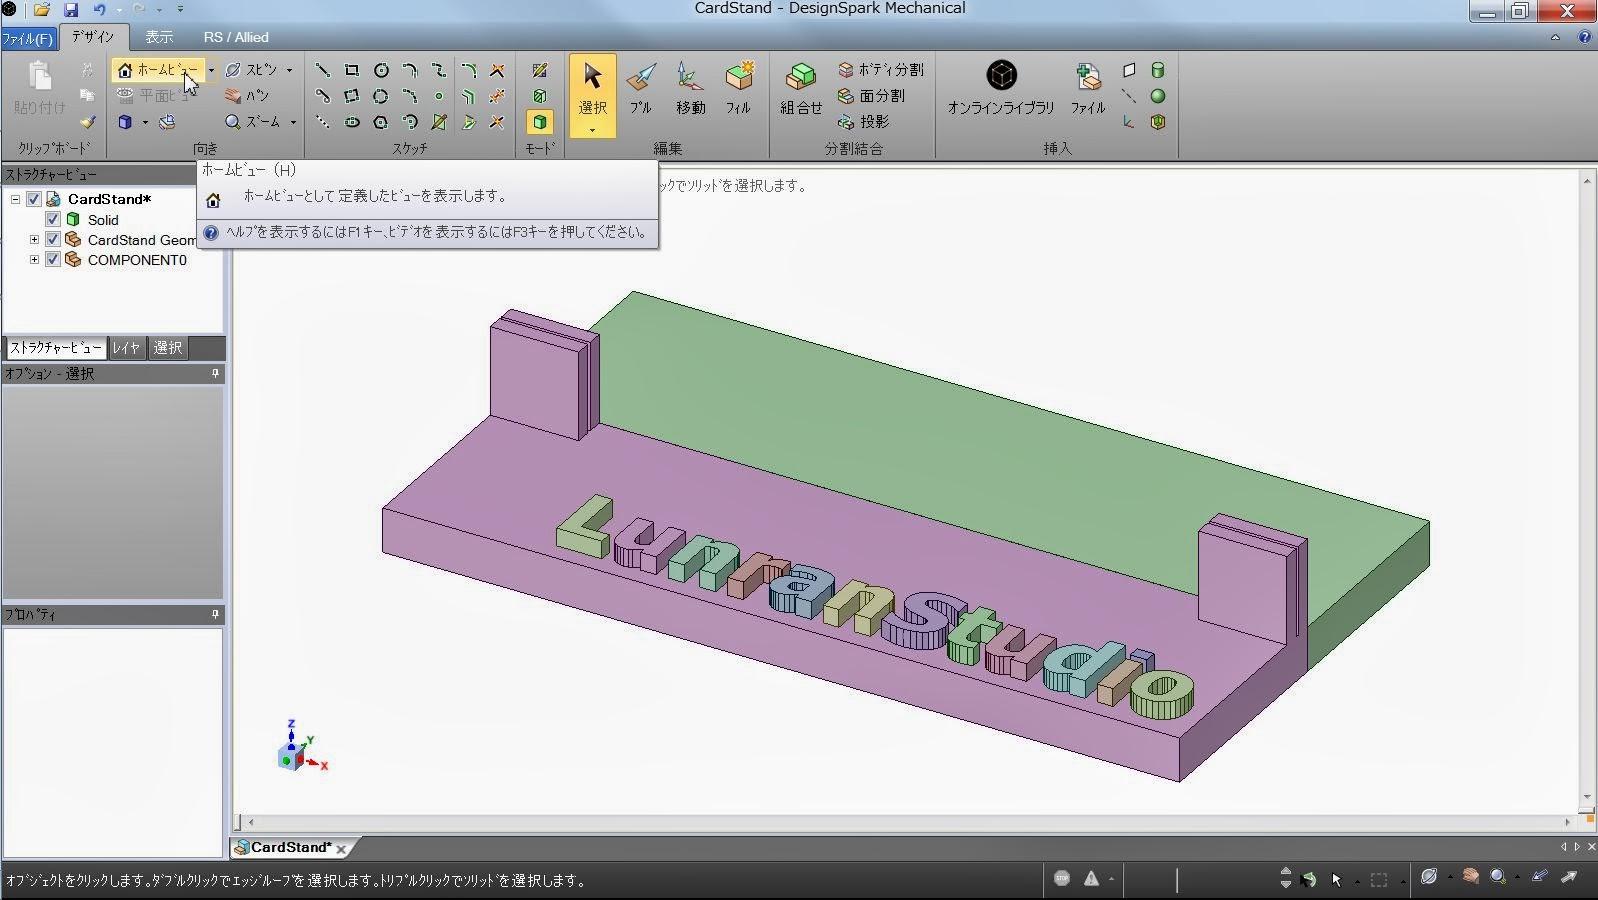 DesignSpark Mechanicalで設計するその1 | Lunran Studio